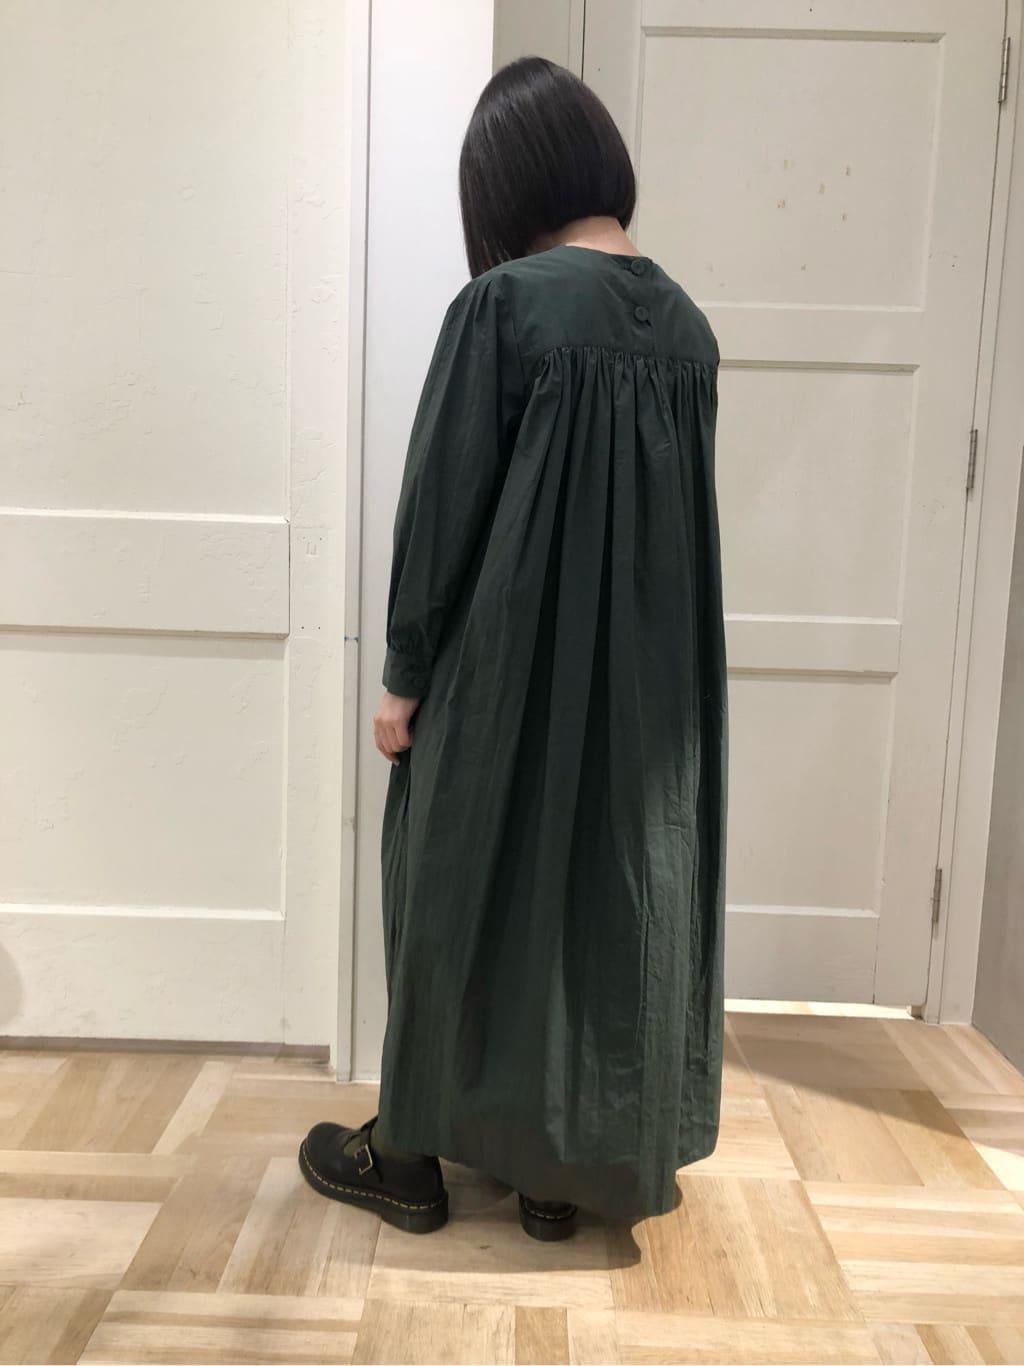 bulle de savon ルミネ大宮 身長:152cm 2021.08.23